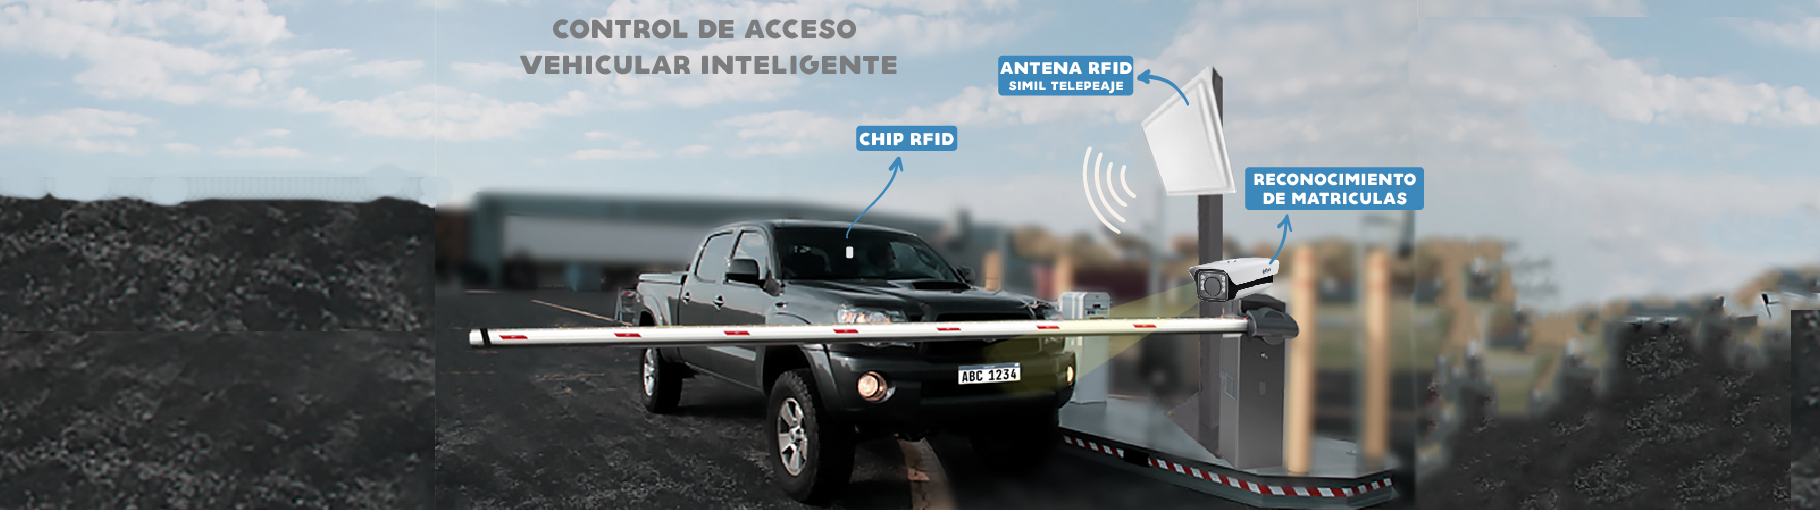 acceso vehicular-100